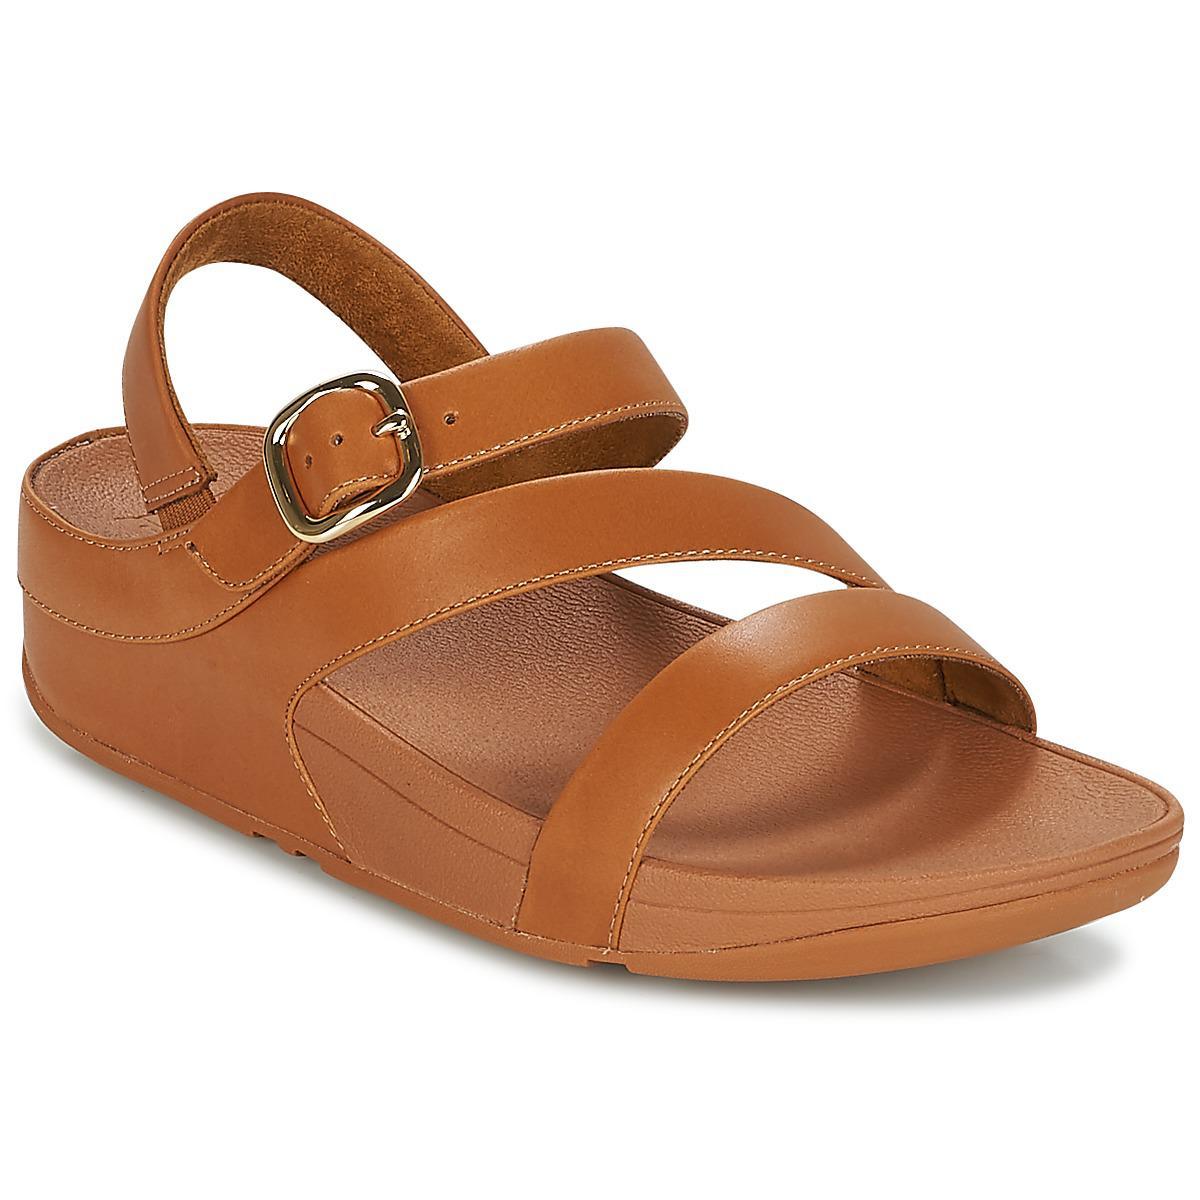 Womens The Skinny Ii Back-Strap Open Toe Sandals FitFlop CtWBSJ3J3i